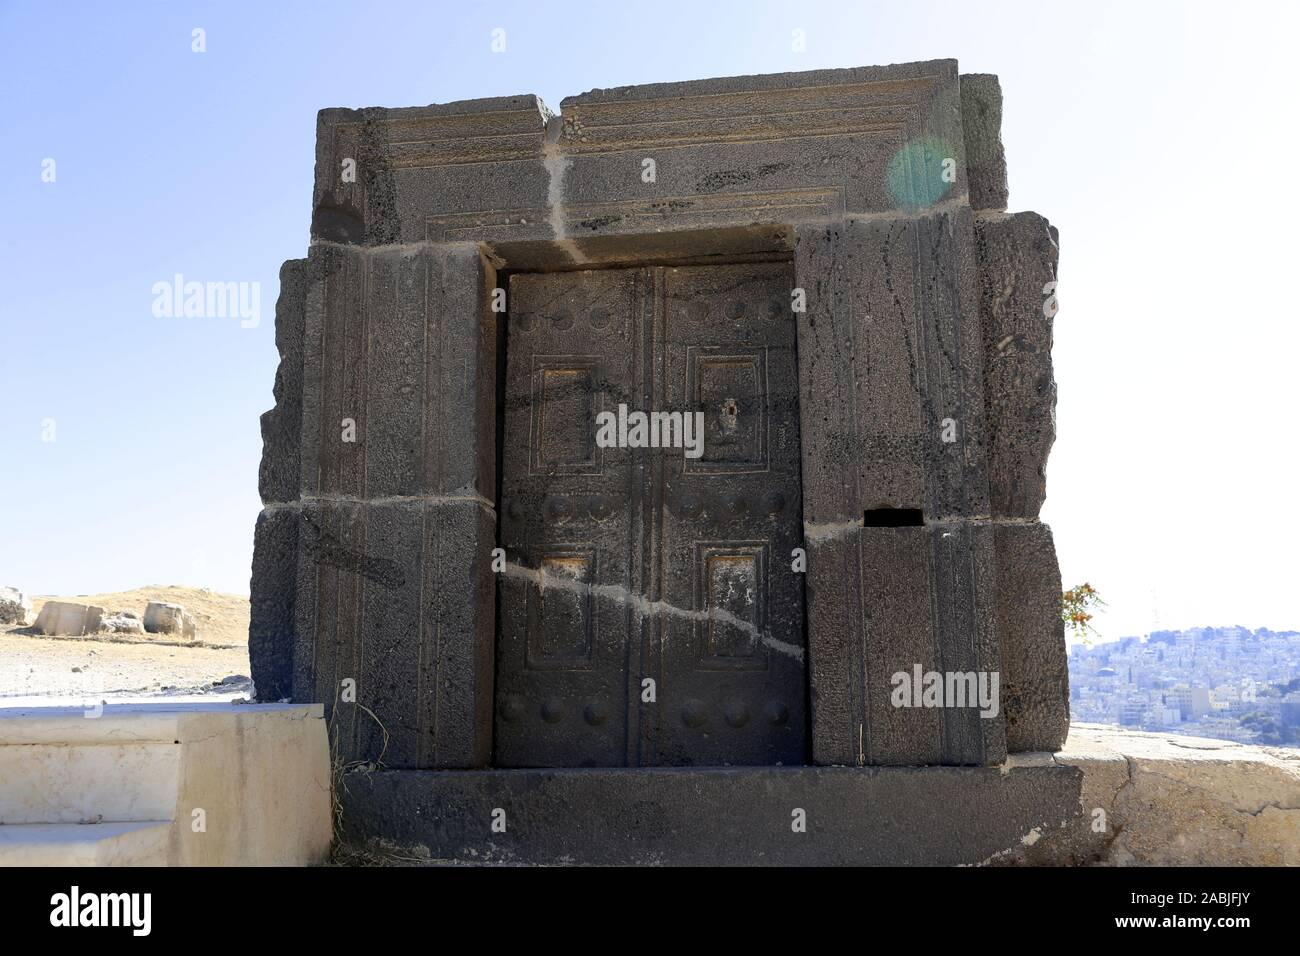 Basalt carved doorway, Sculpture Gardens, Jordan Archaeological Museum, Citadel, Ali Ben Al Hussein Street, Jabal Al Qalah, Amman, Jordan, Middle East Stock Photo